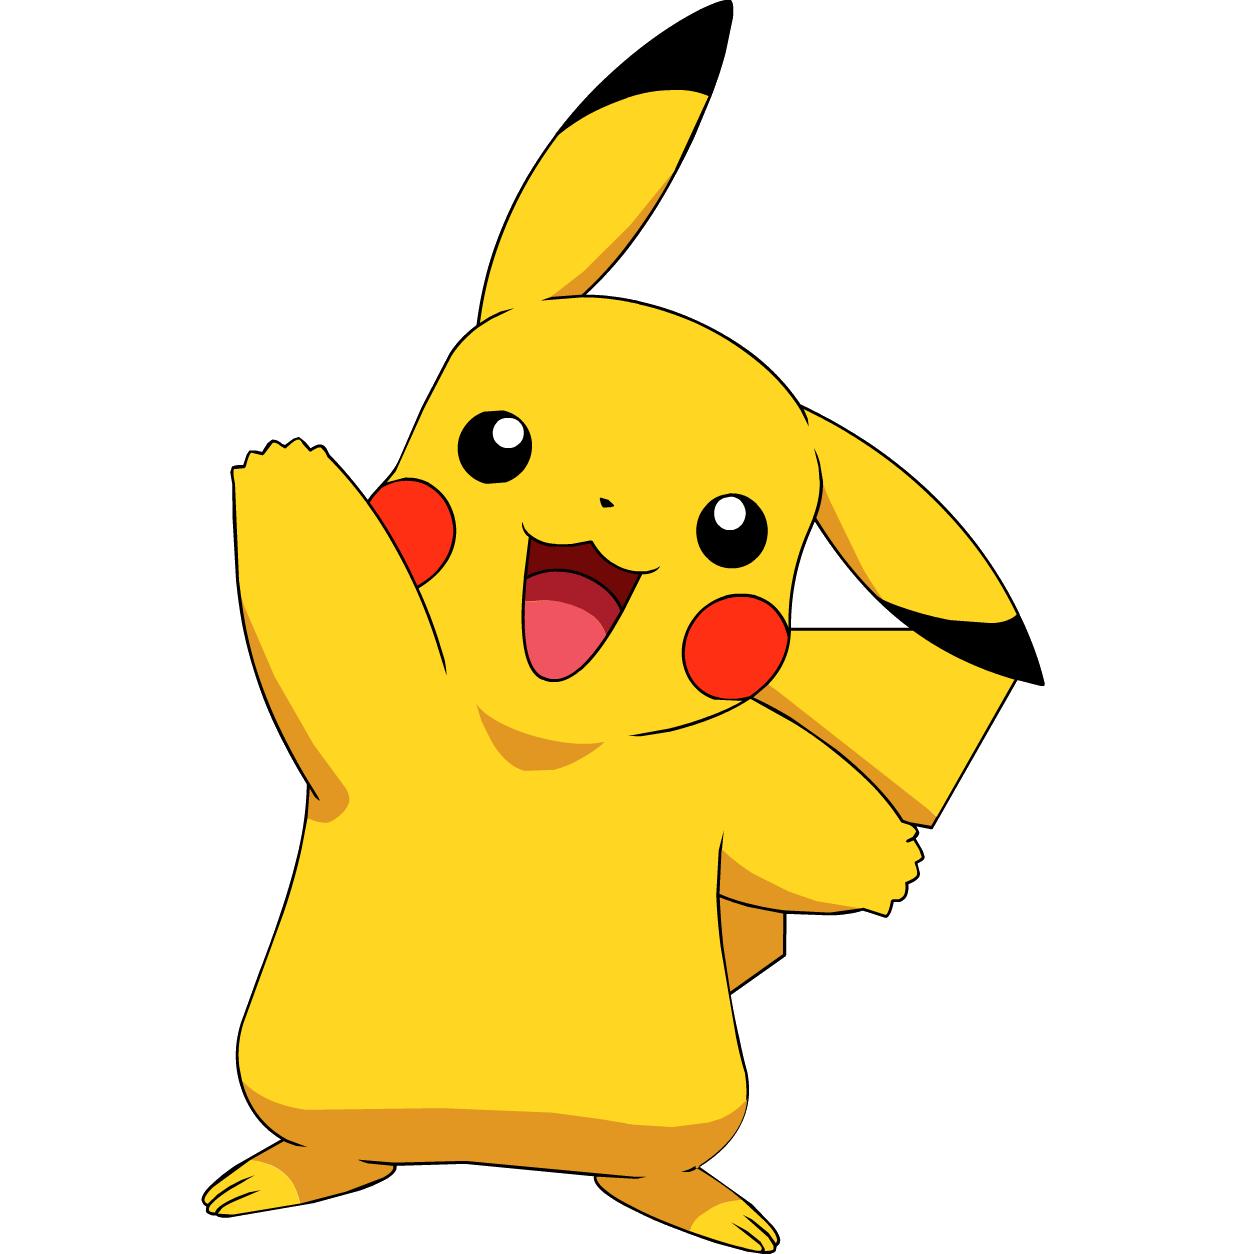 Poka C Mon Soft Polyester Fiber Fill Kids Pikachu Pillow Pikachu Pikachu Drawing Pokemon Fabric